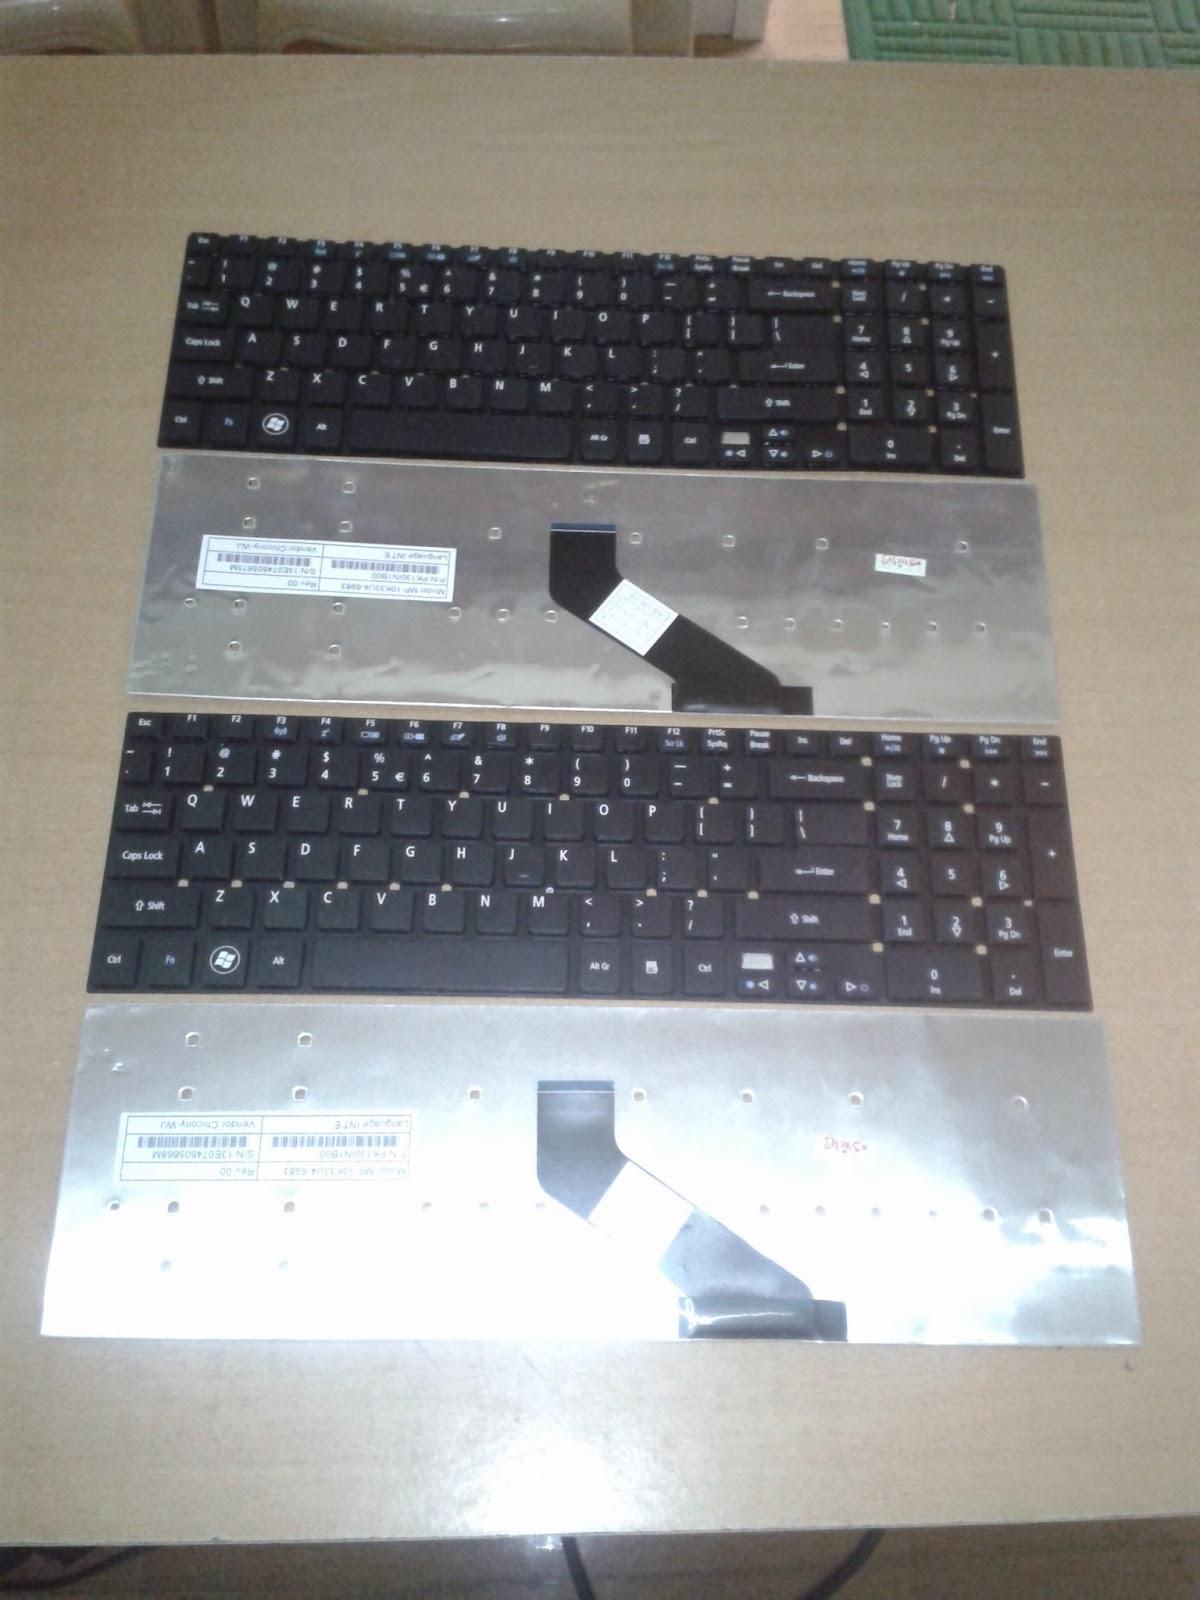 laptop accessories spare parts replacement calicut malappuram kannur acer aspire 5755 keyboard. Black Bedroom Furniture Sets. Home Design Ideas